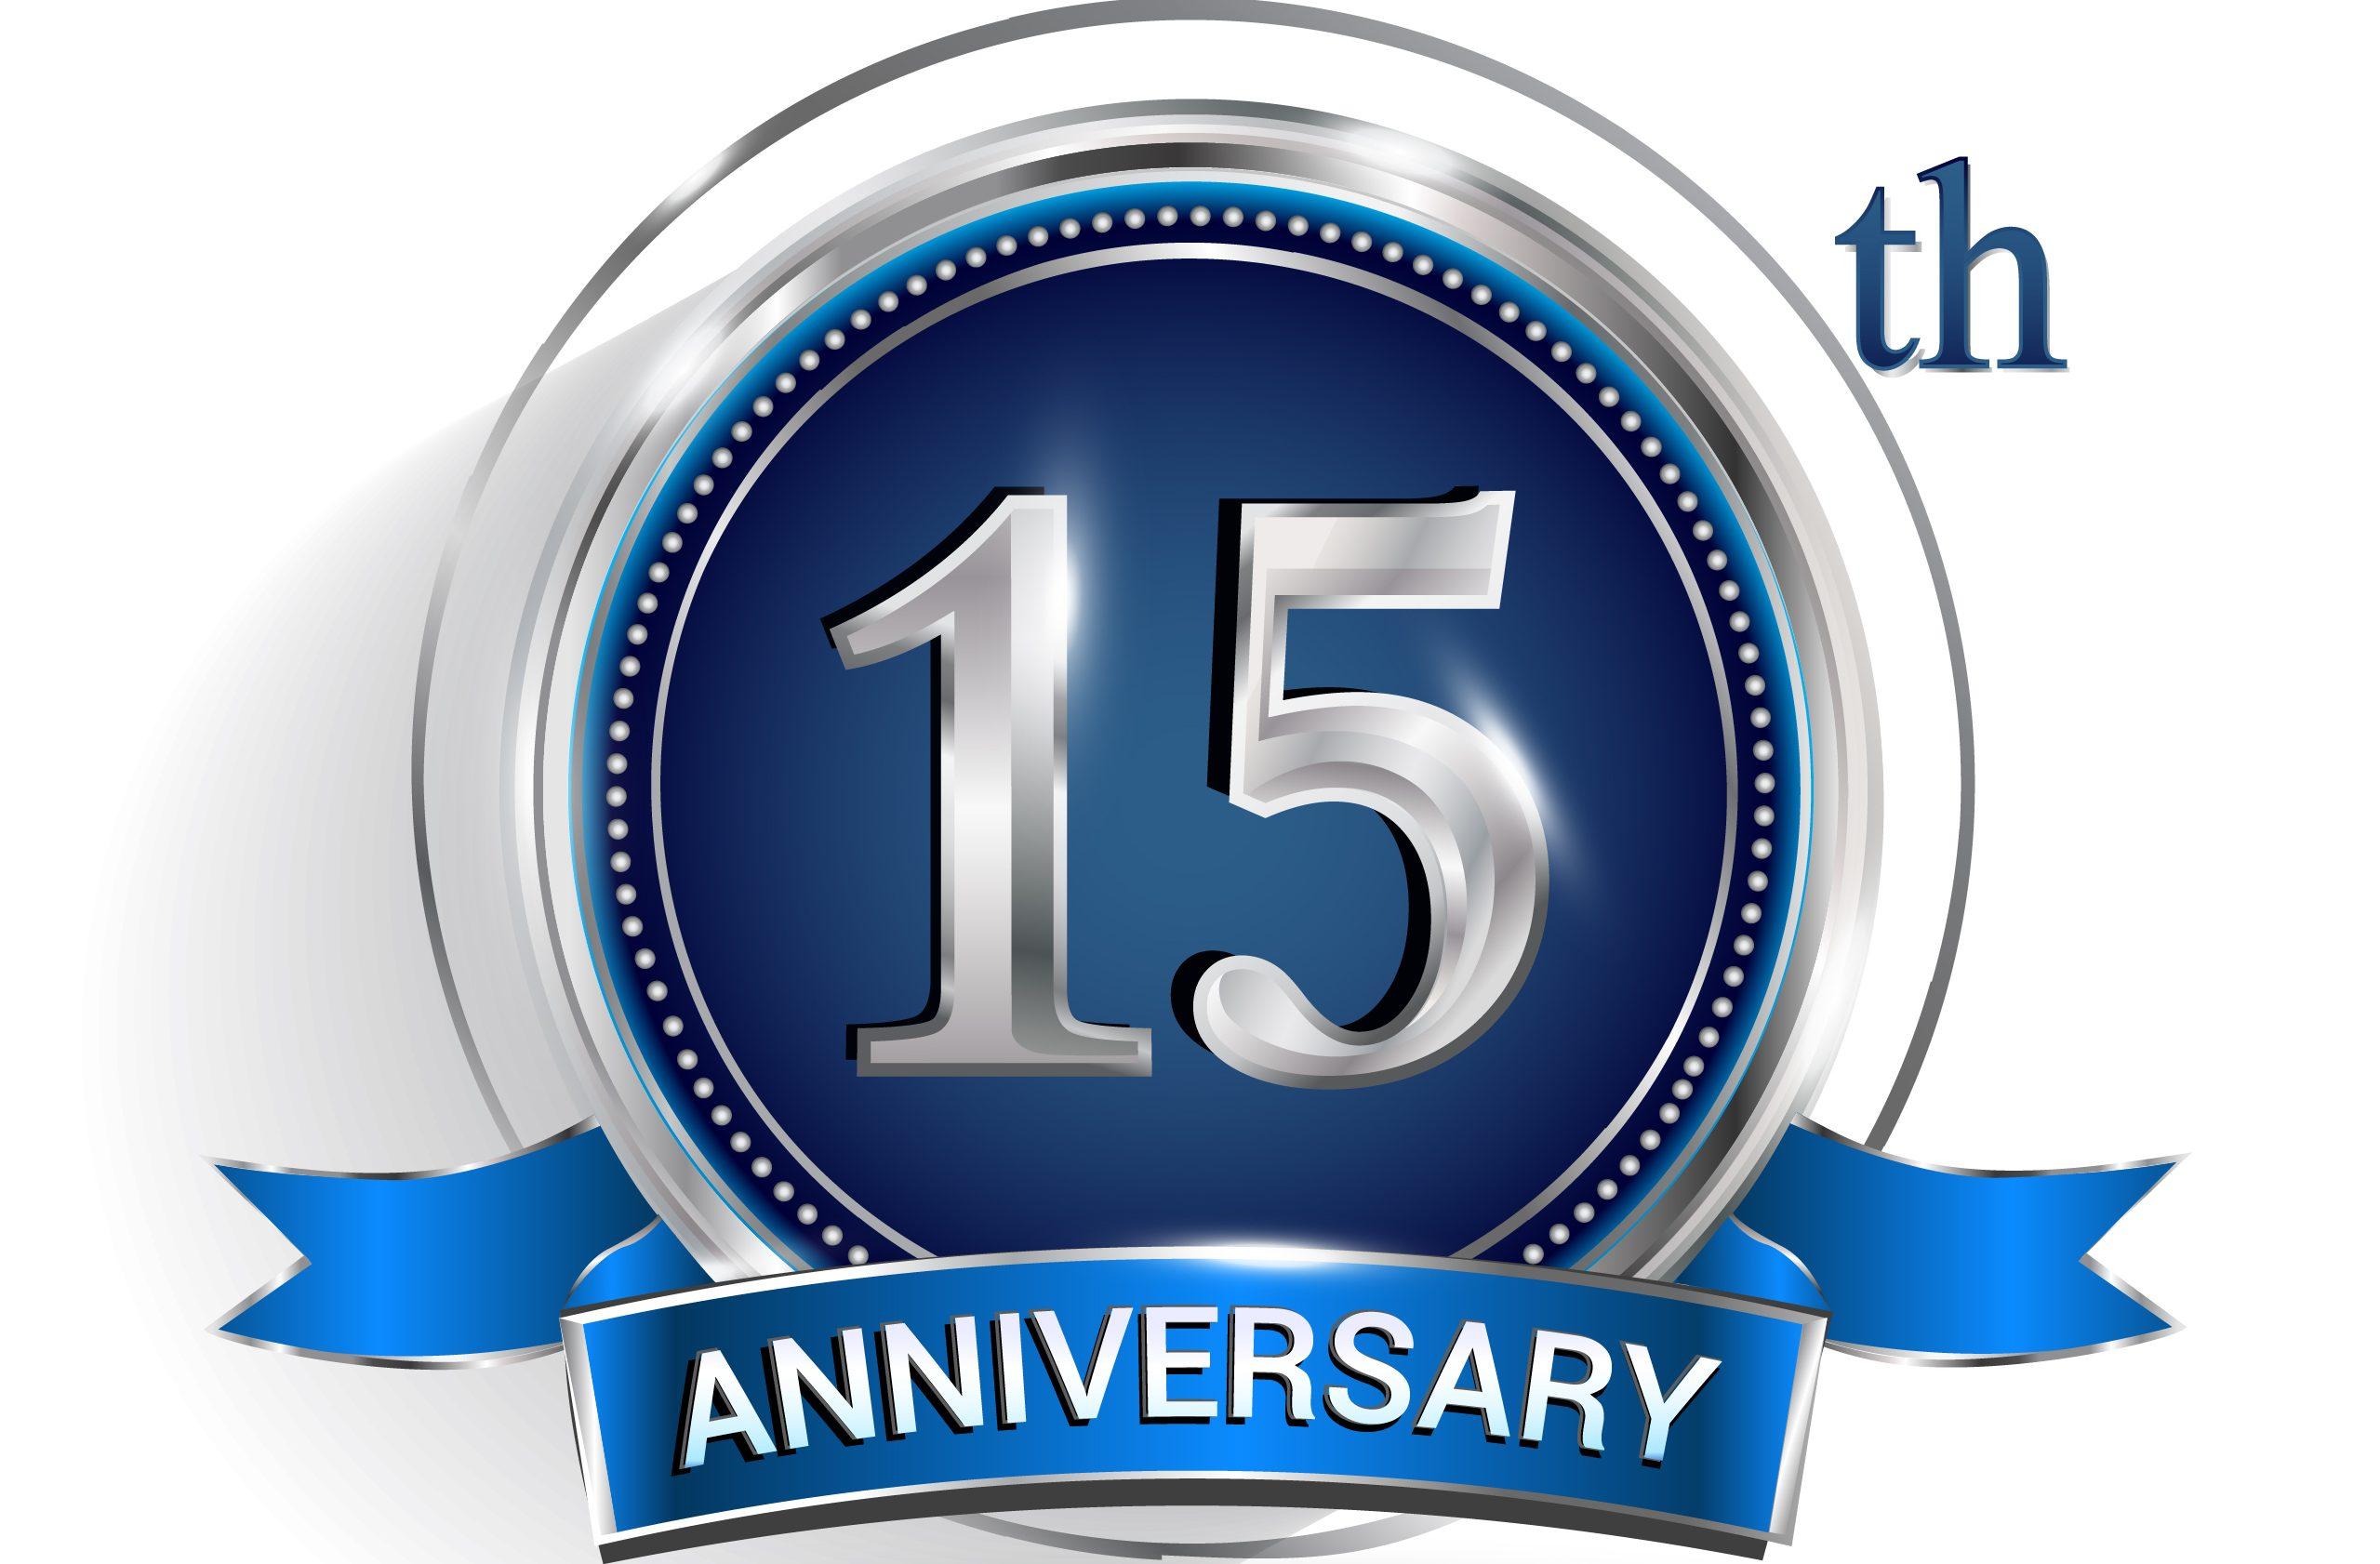 Lear Werts Celebrates 15th Anniversary